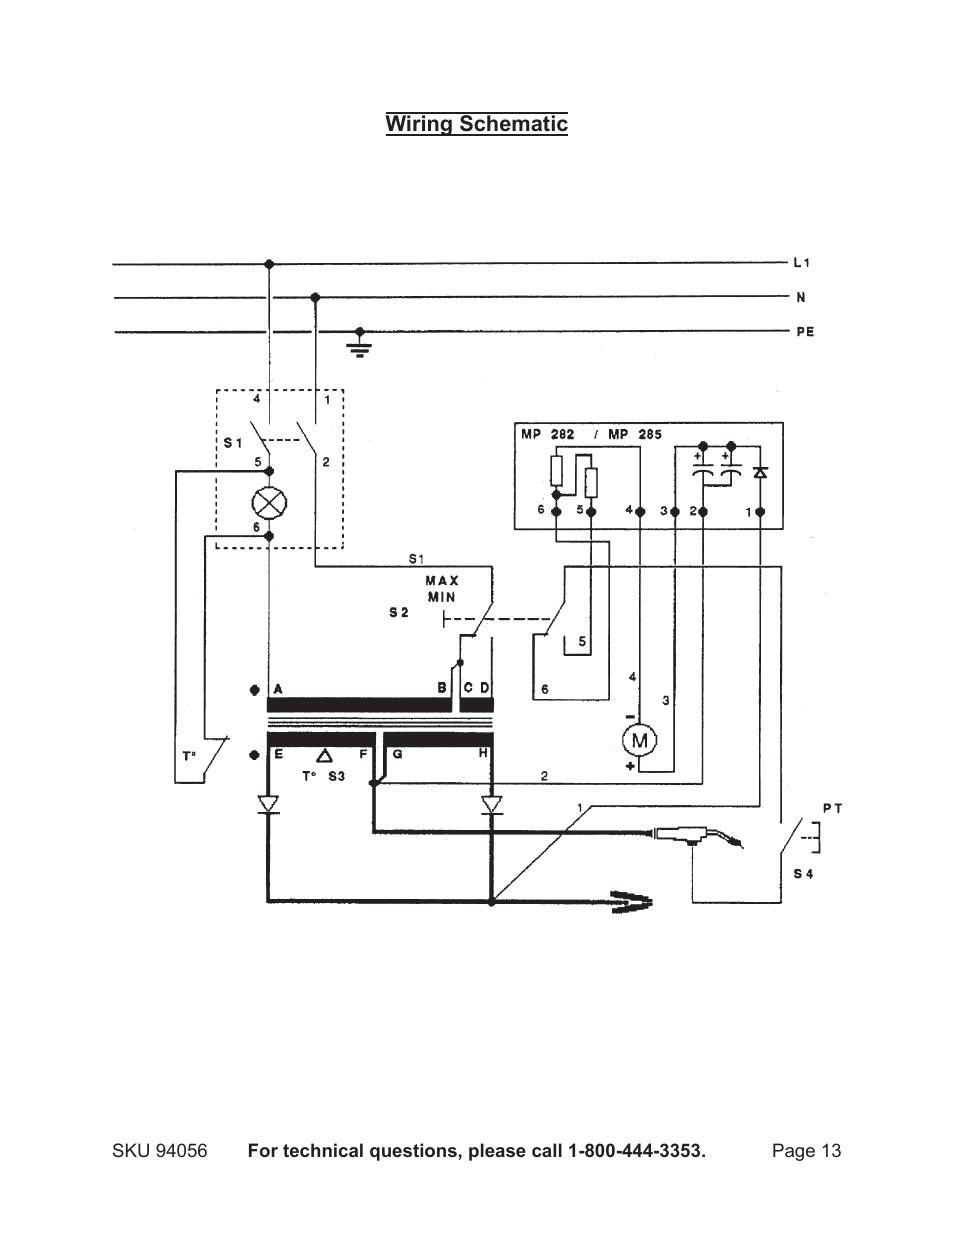 medium resolution of wiring diagram for chicago electric welder wiring diagram used chicago electric hoist wiring diagram chicago wiring diagram